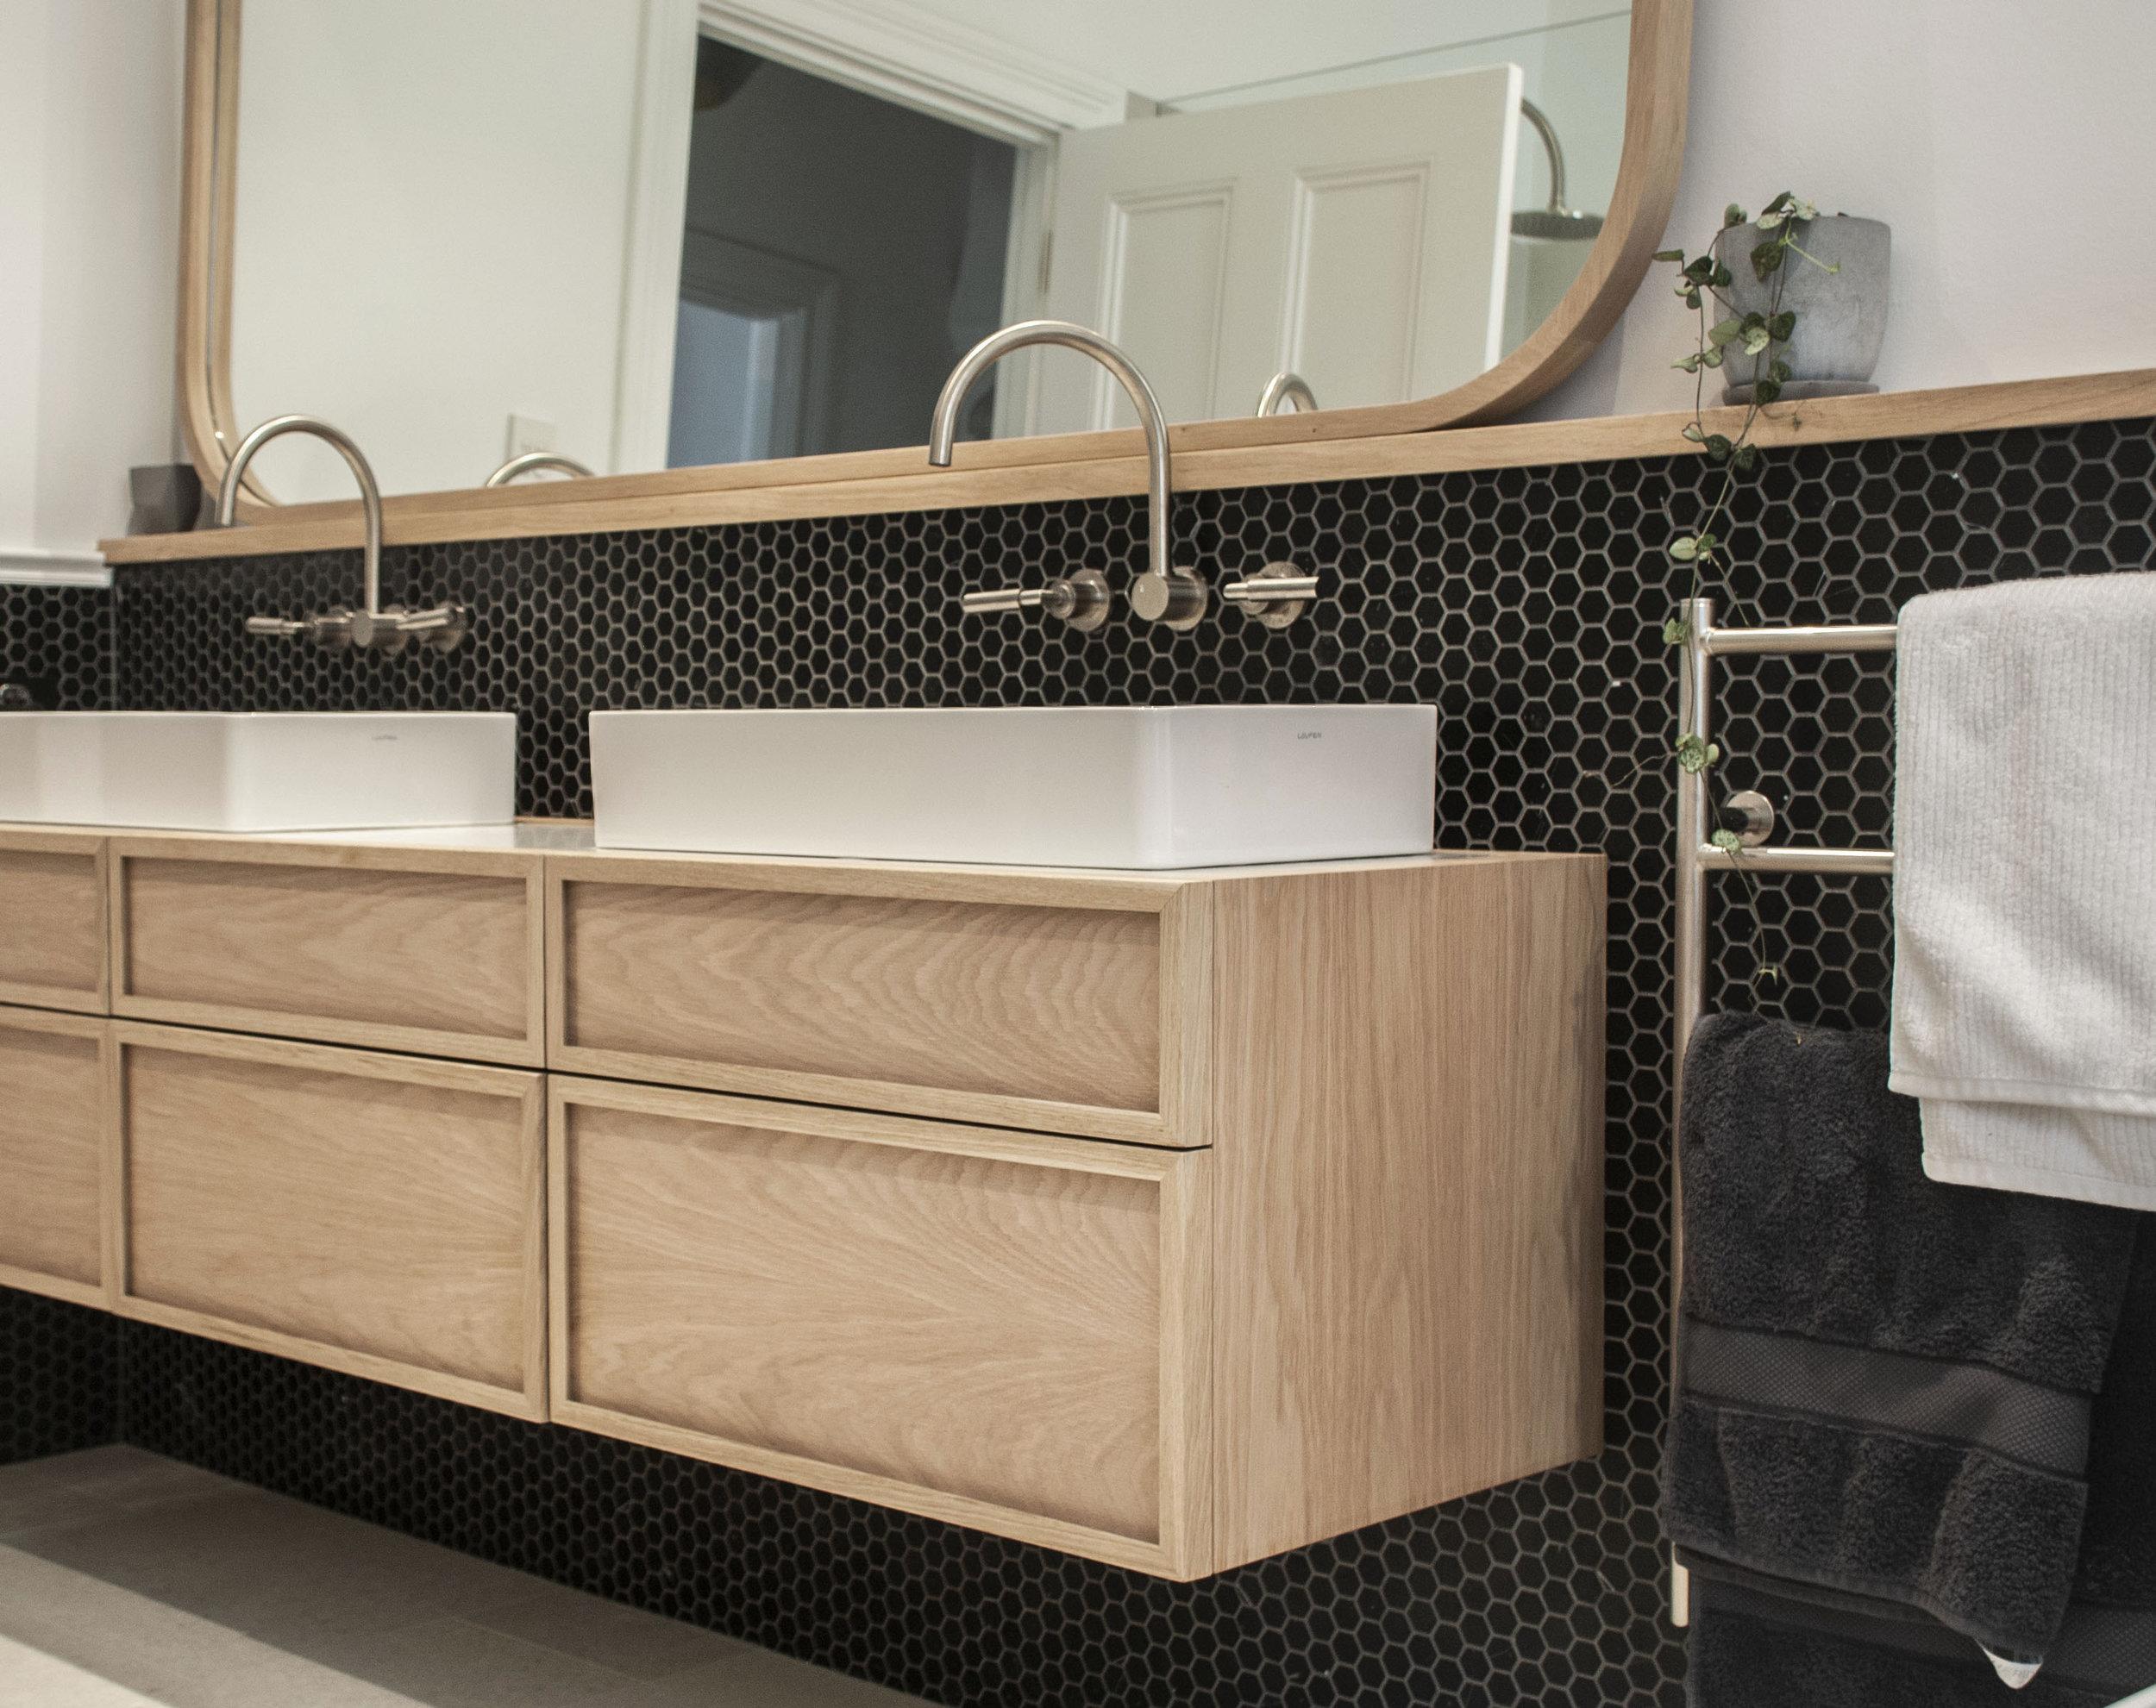 Turner Interior Design - Shenton park house - Bathroom 2.jpg